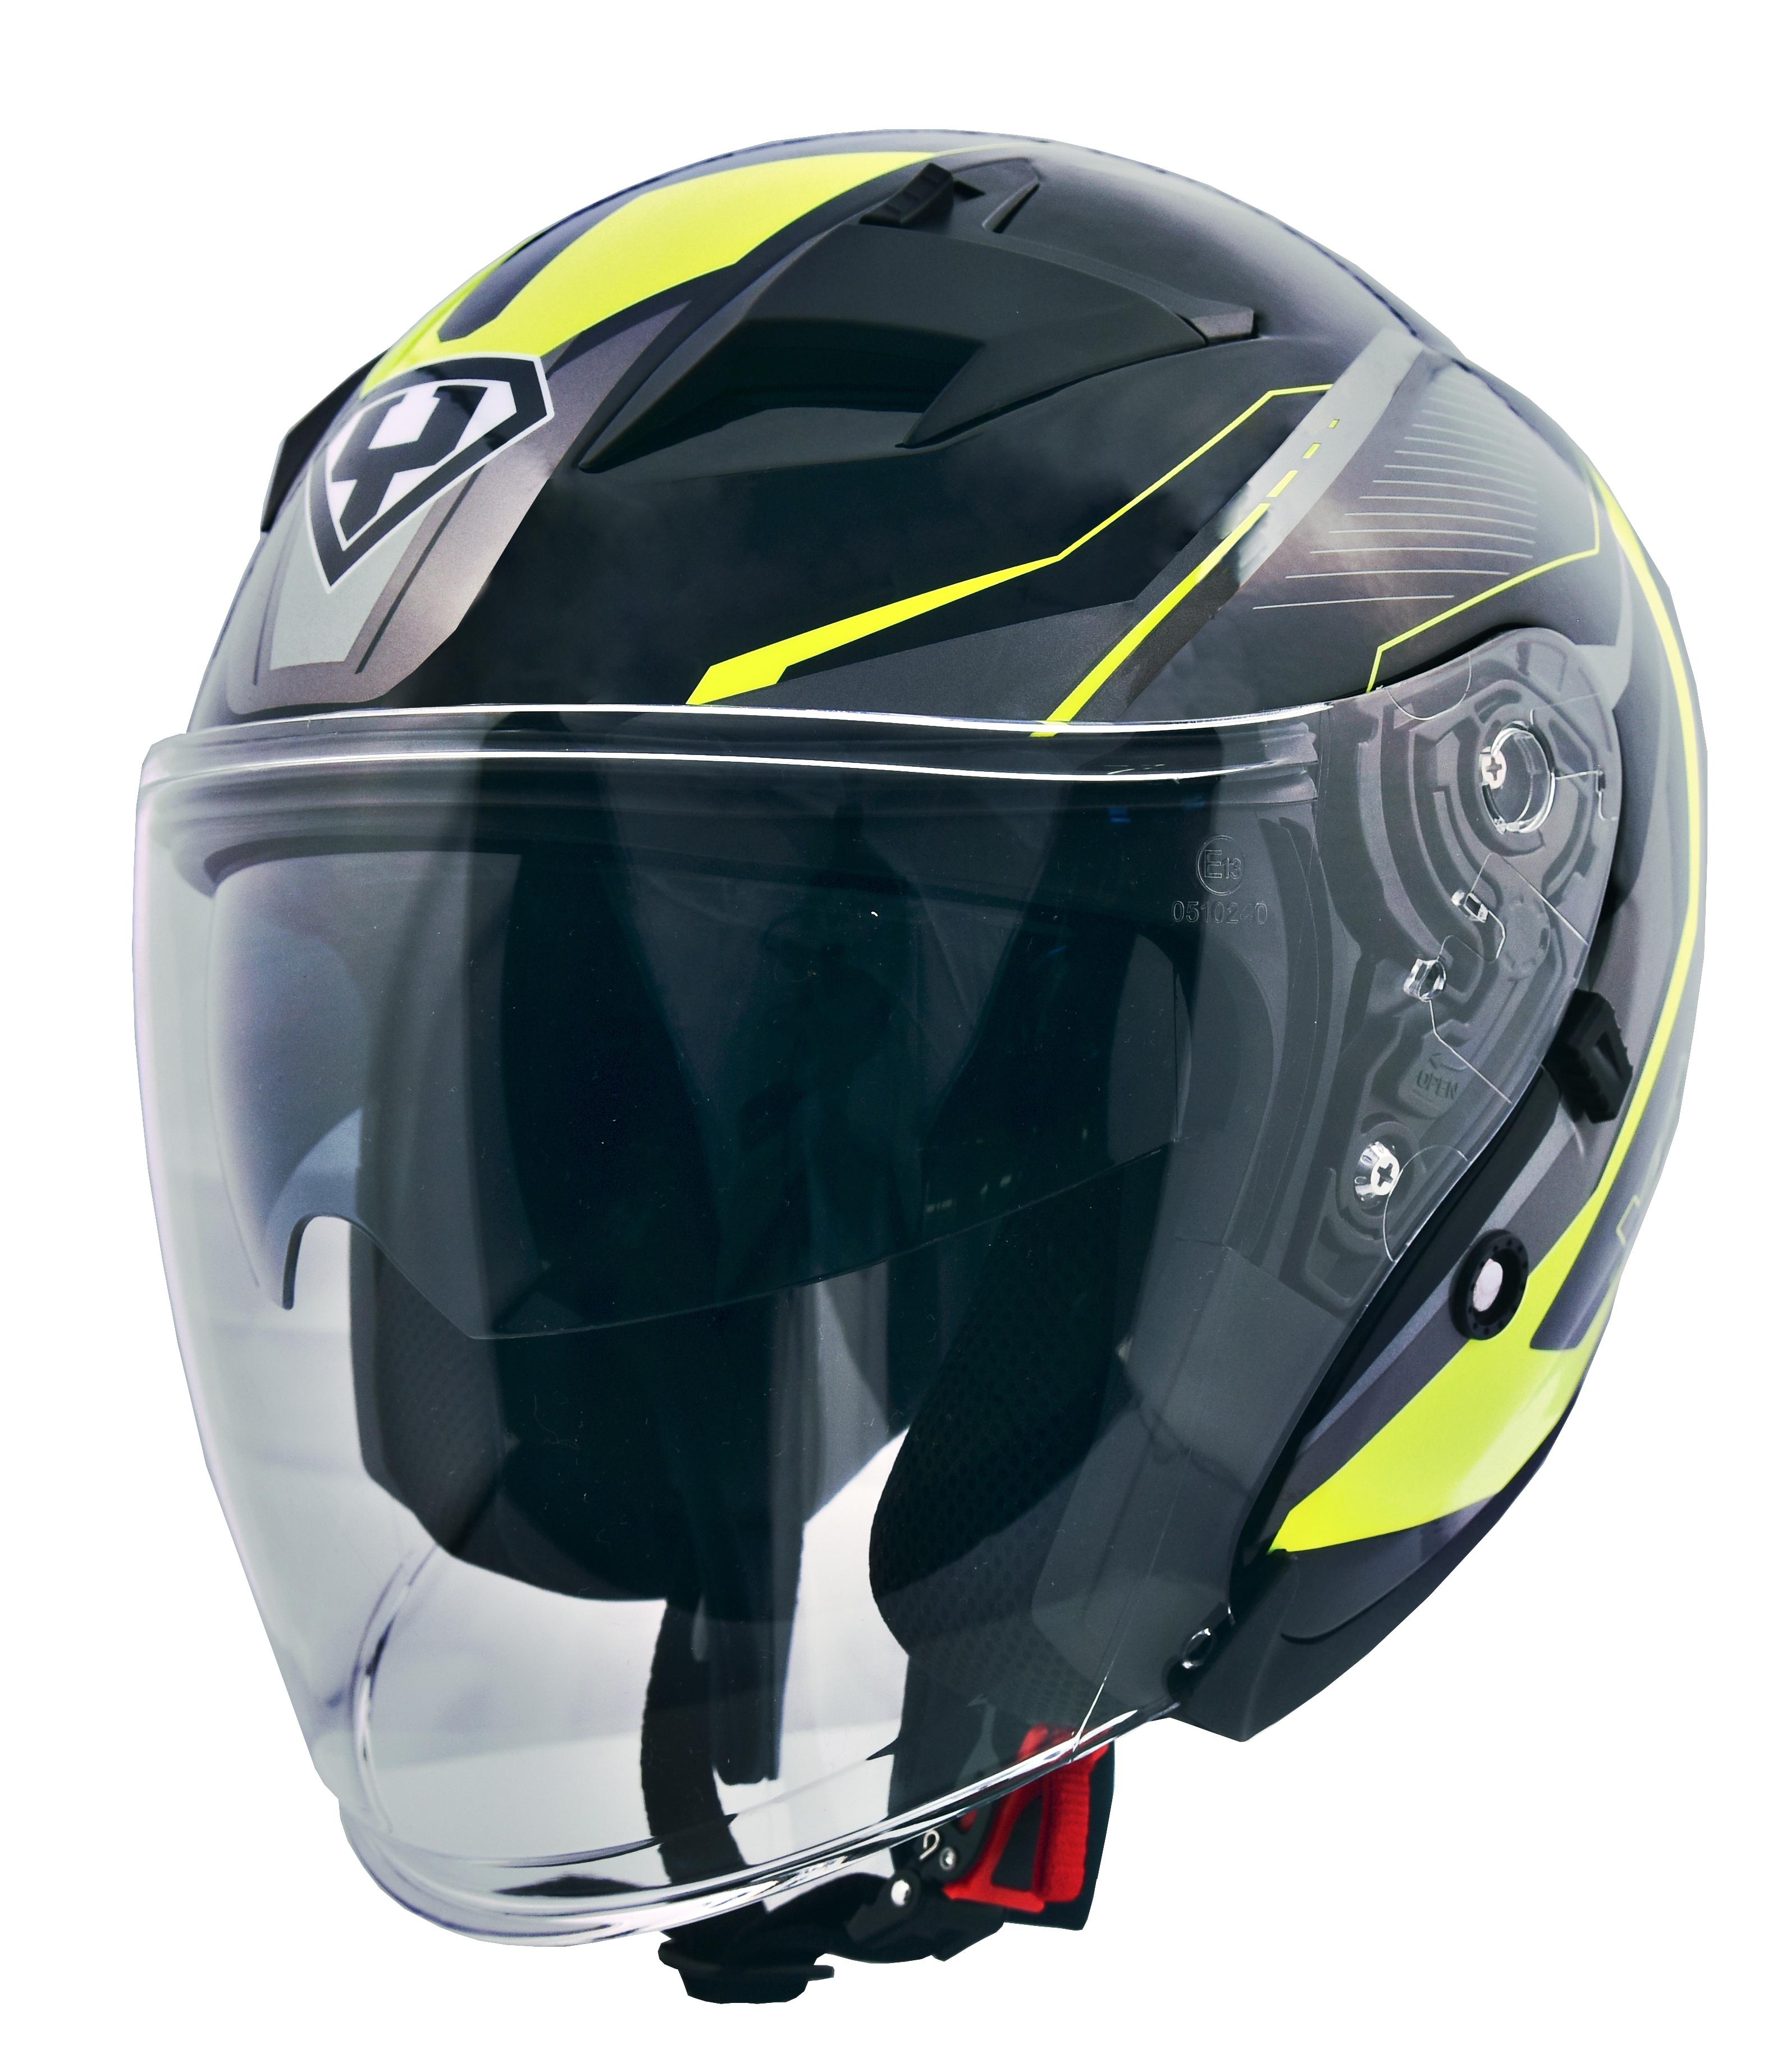 Moto helma Yohe 878-1 Fluo